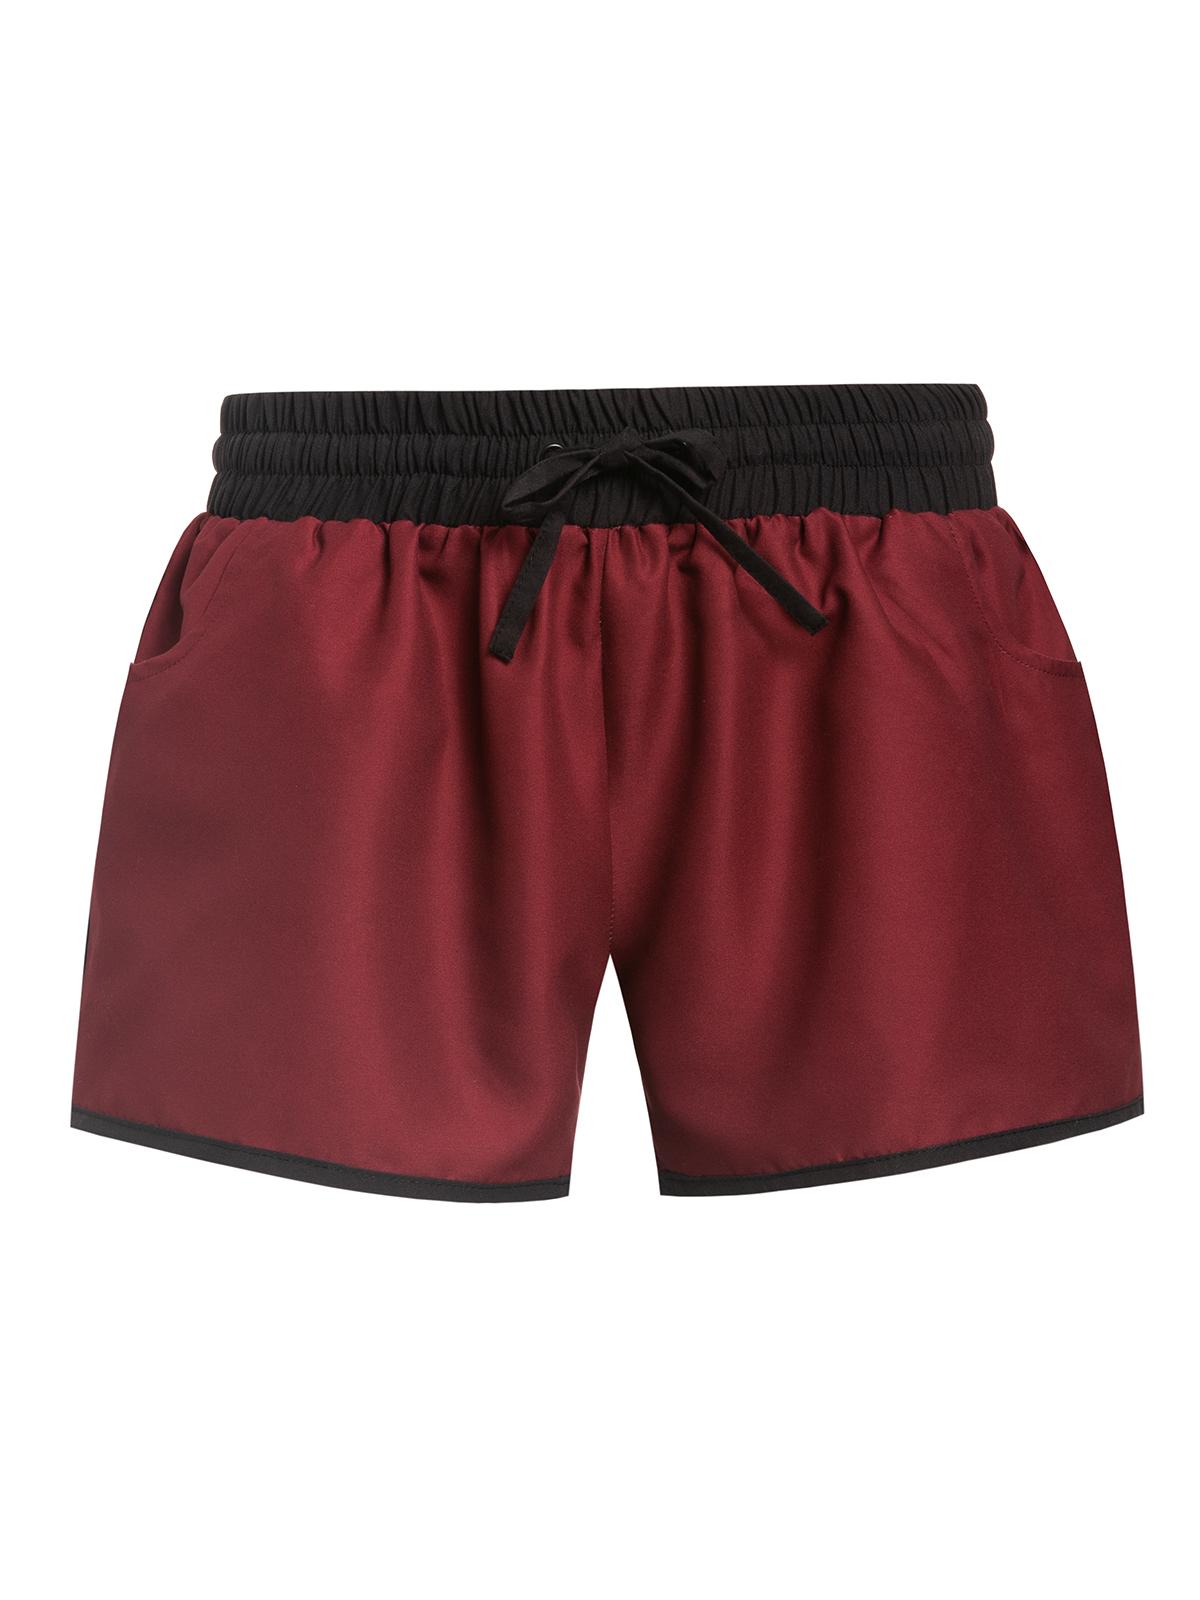 Bademode - Pussy Deluxe Red Lovers Damen Boardshorts – Größe XXL  - Onlineshop NAPO Shop